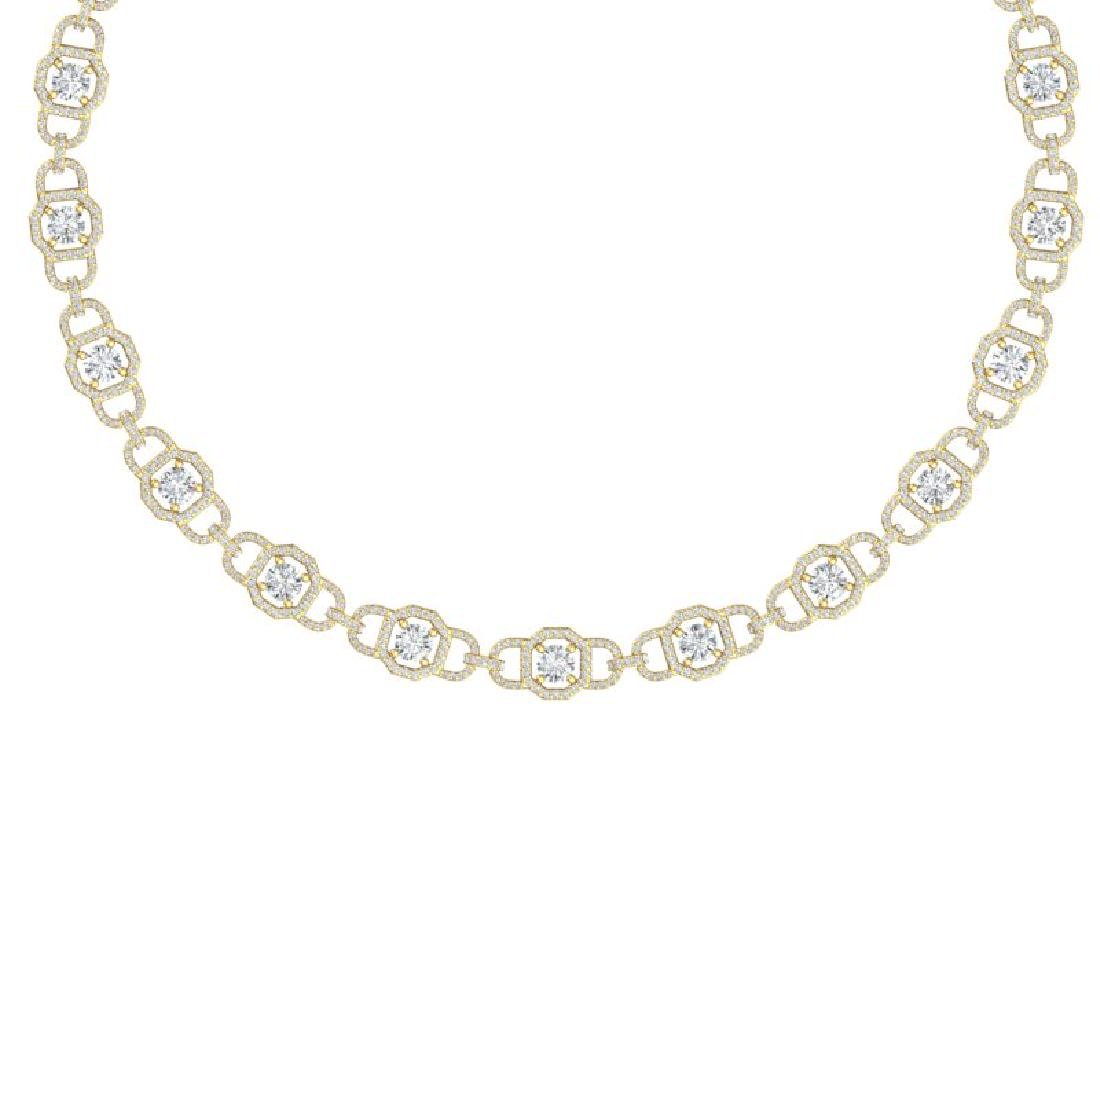 25 CTW Certified SI/I Diamond Halo Necklace 18K Yellow